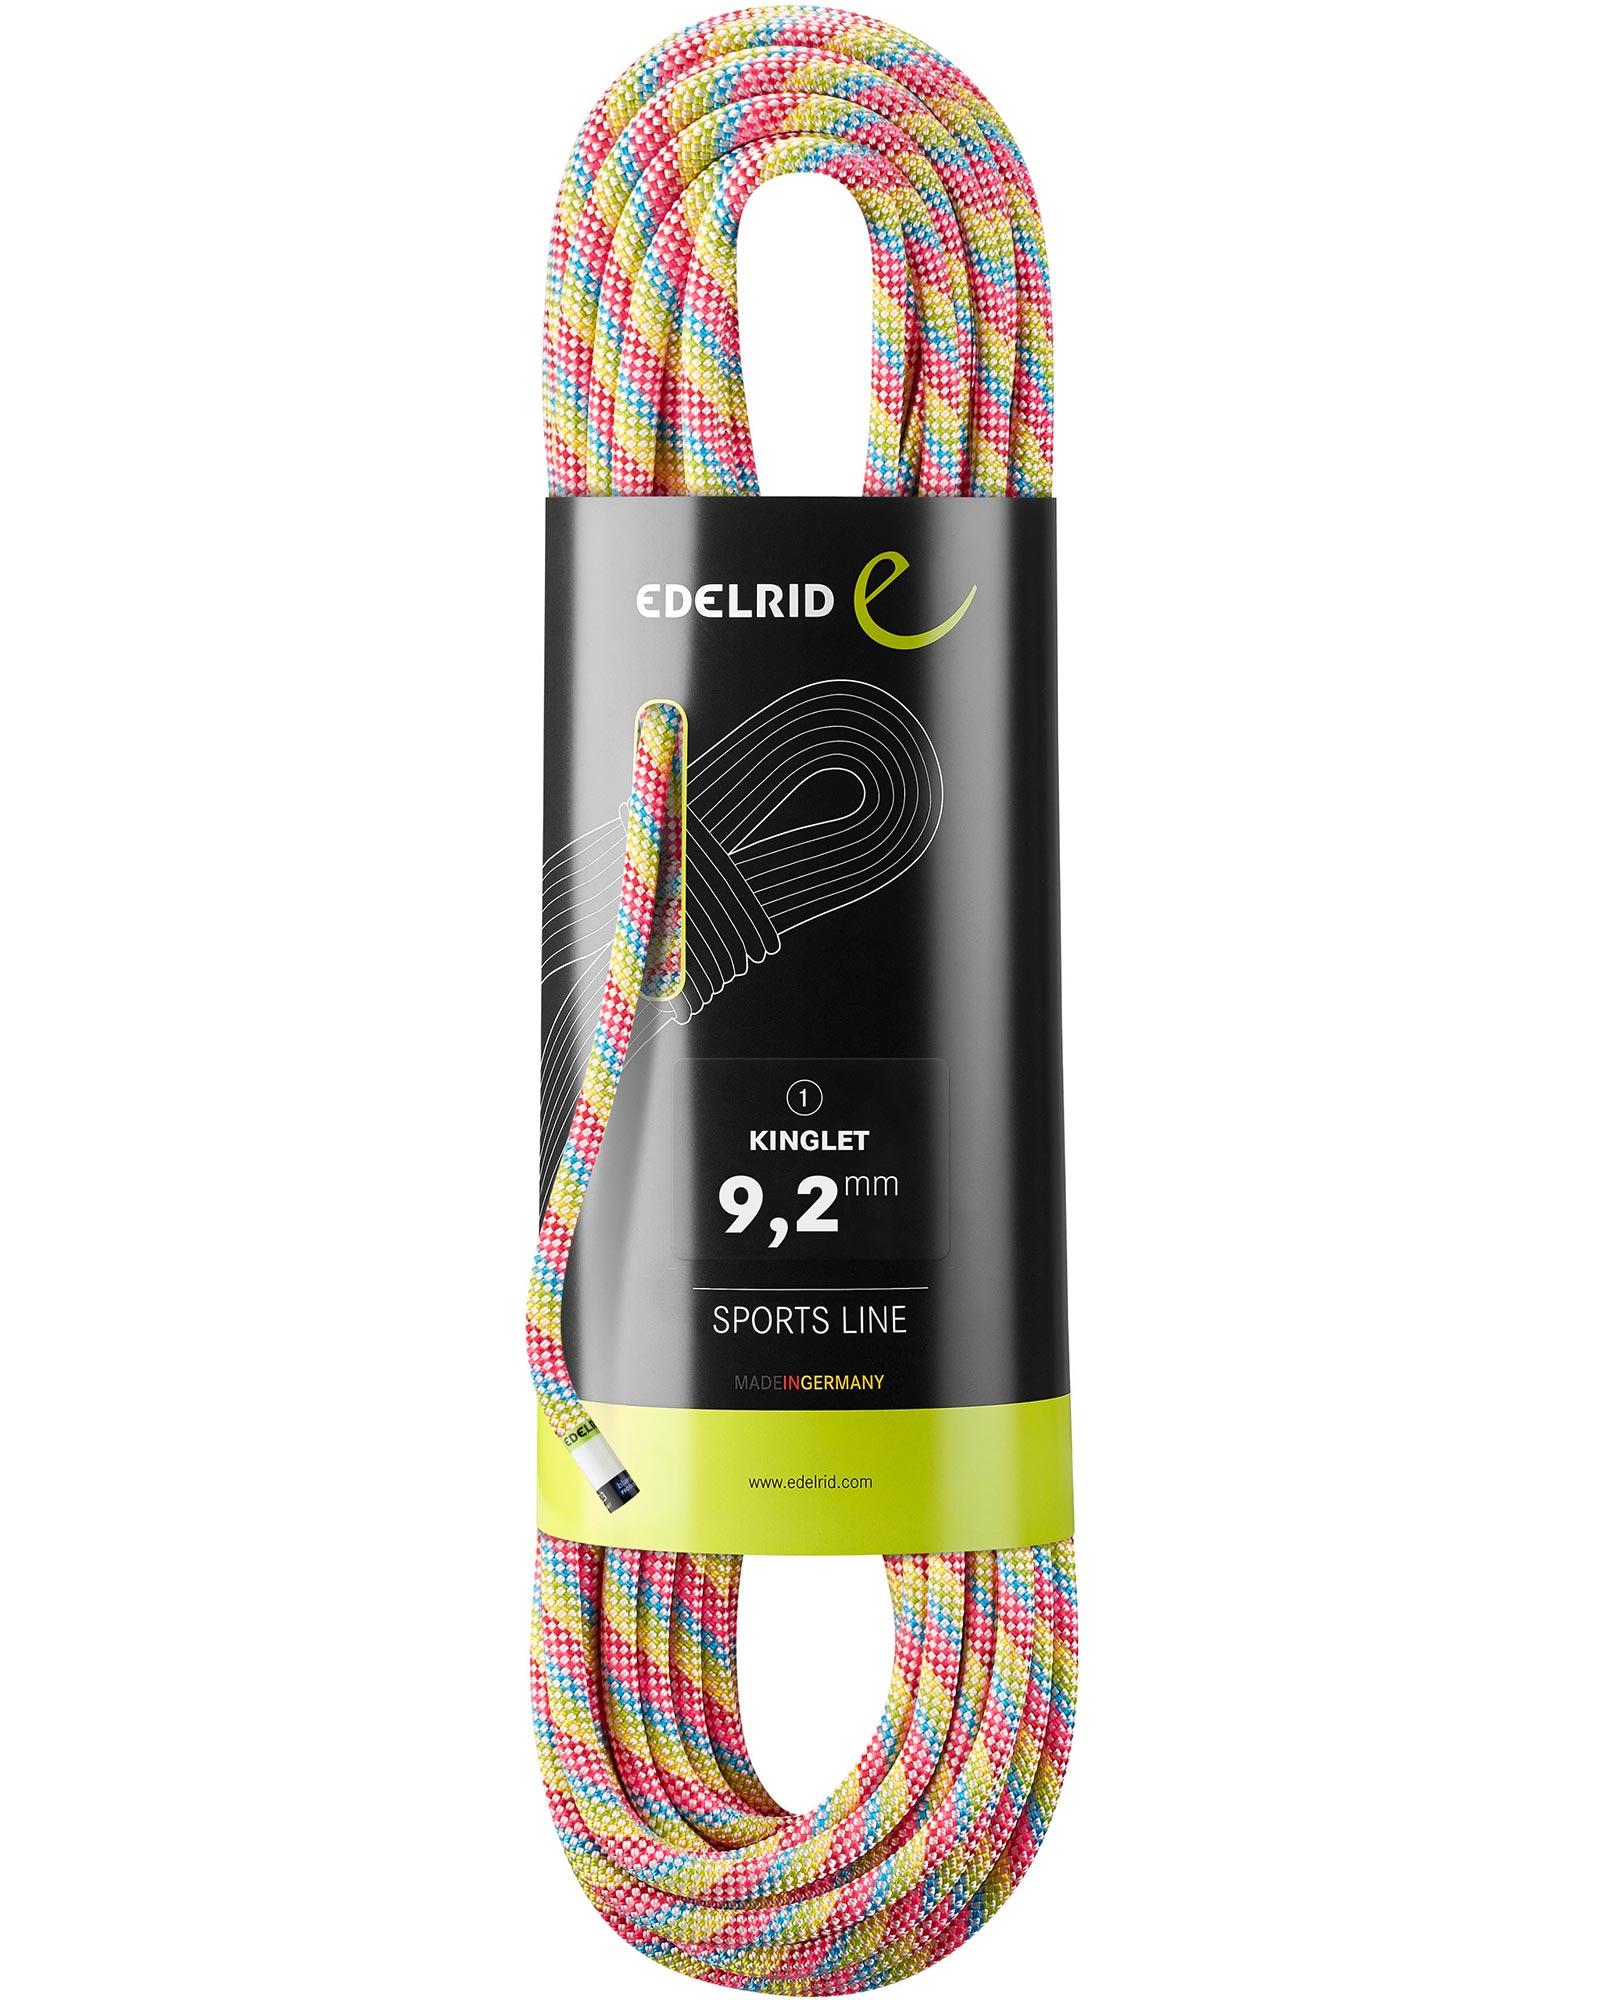 Edelrid Kinglet 9.2 x 70 Rope 0